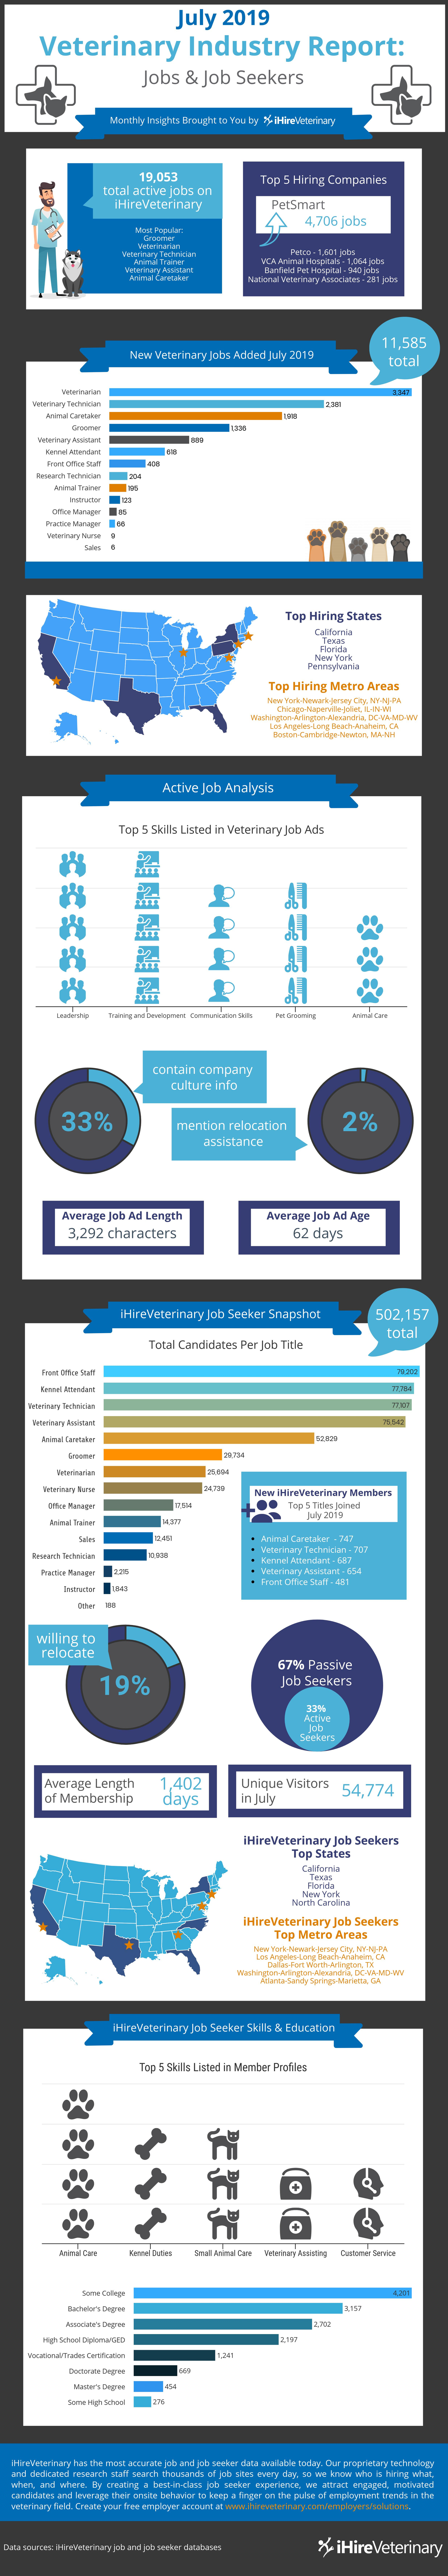 ihireveterinary july 2019 veterinary industry infographic